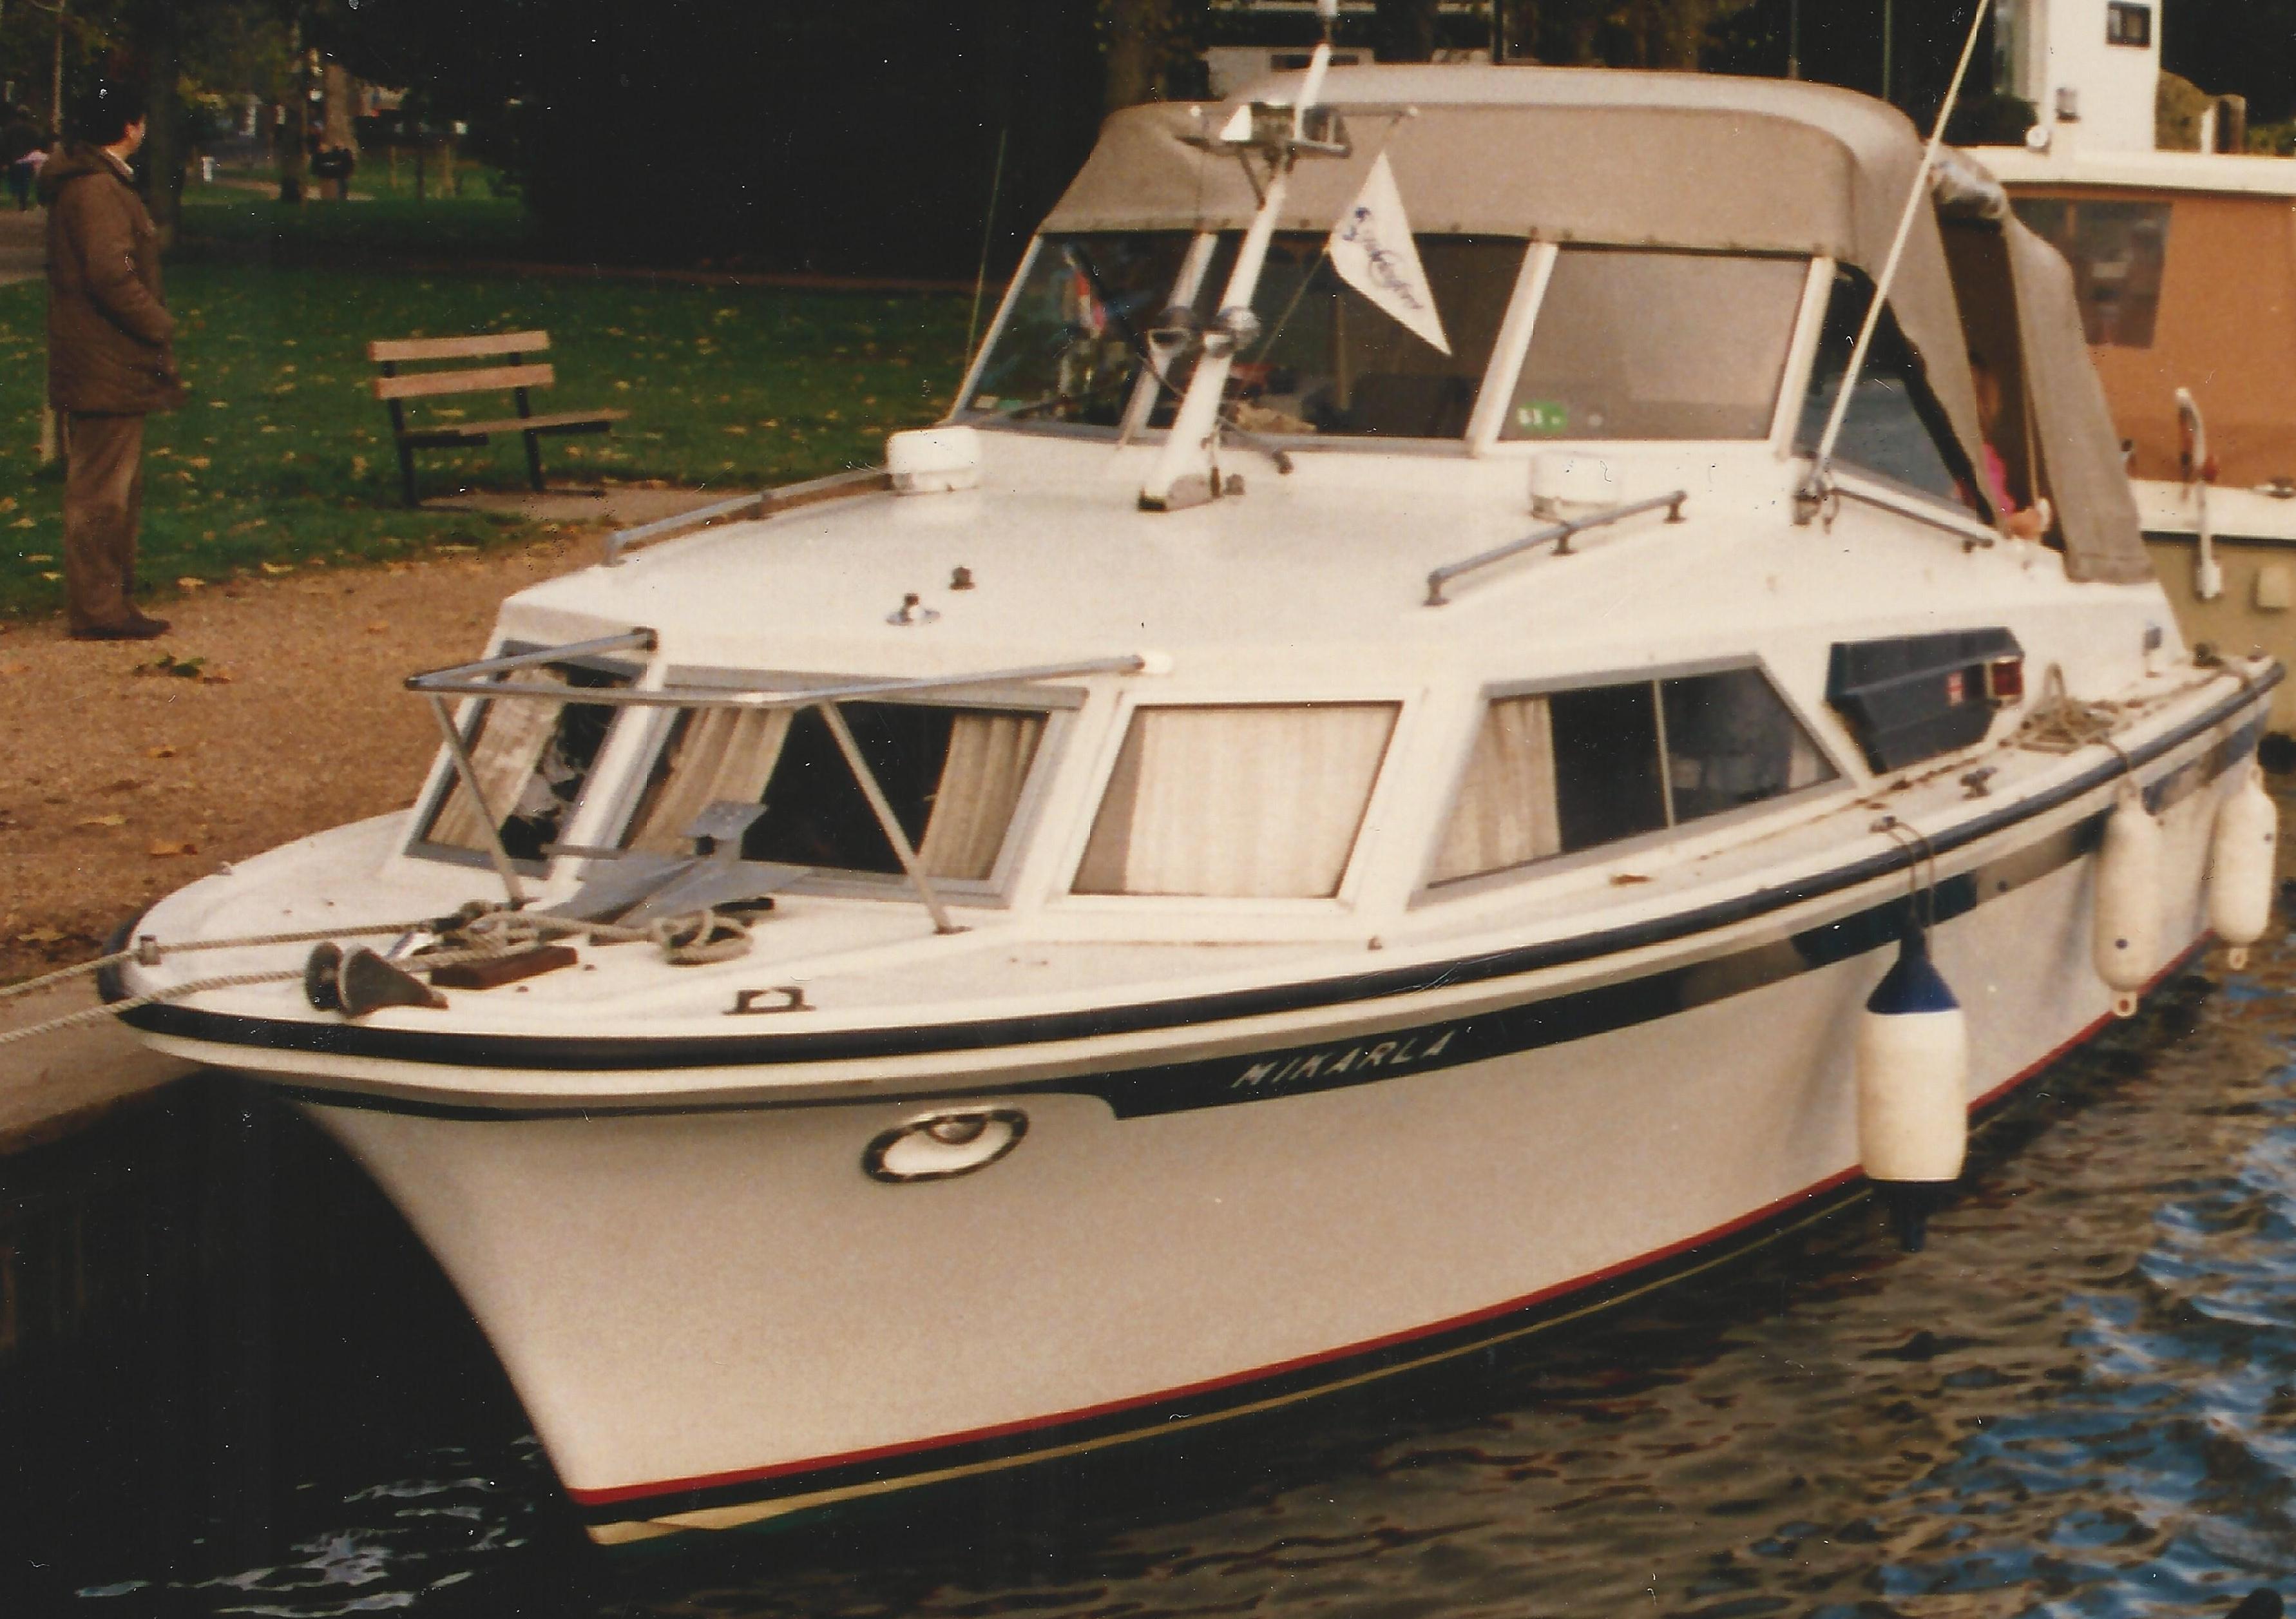 ffjord-27-mikarla-of-welwyn0026.jpg